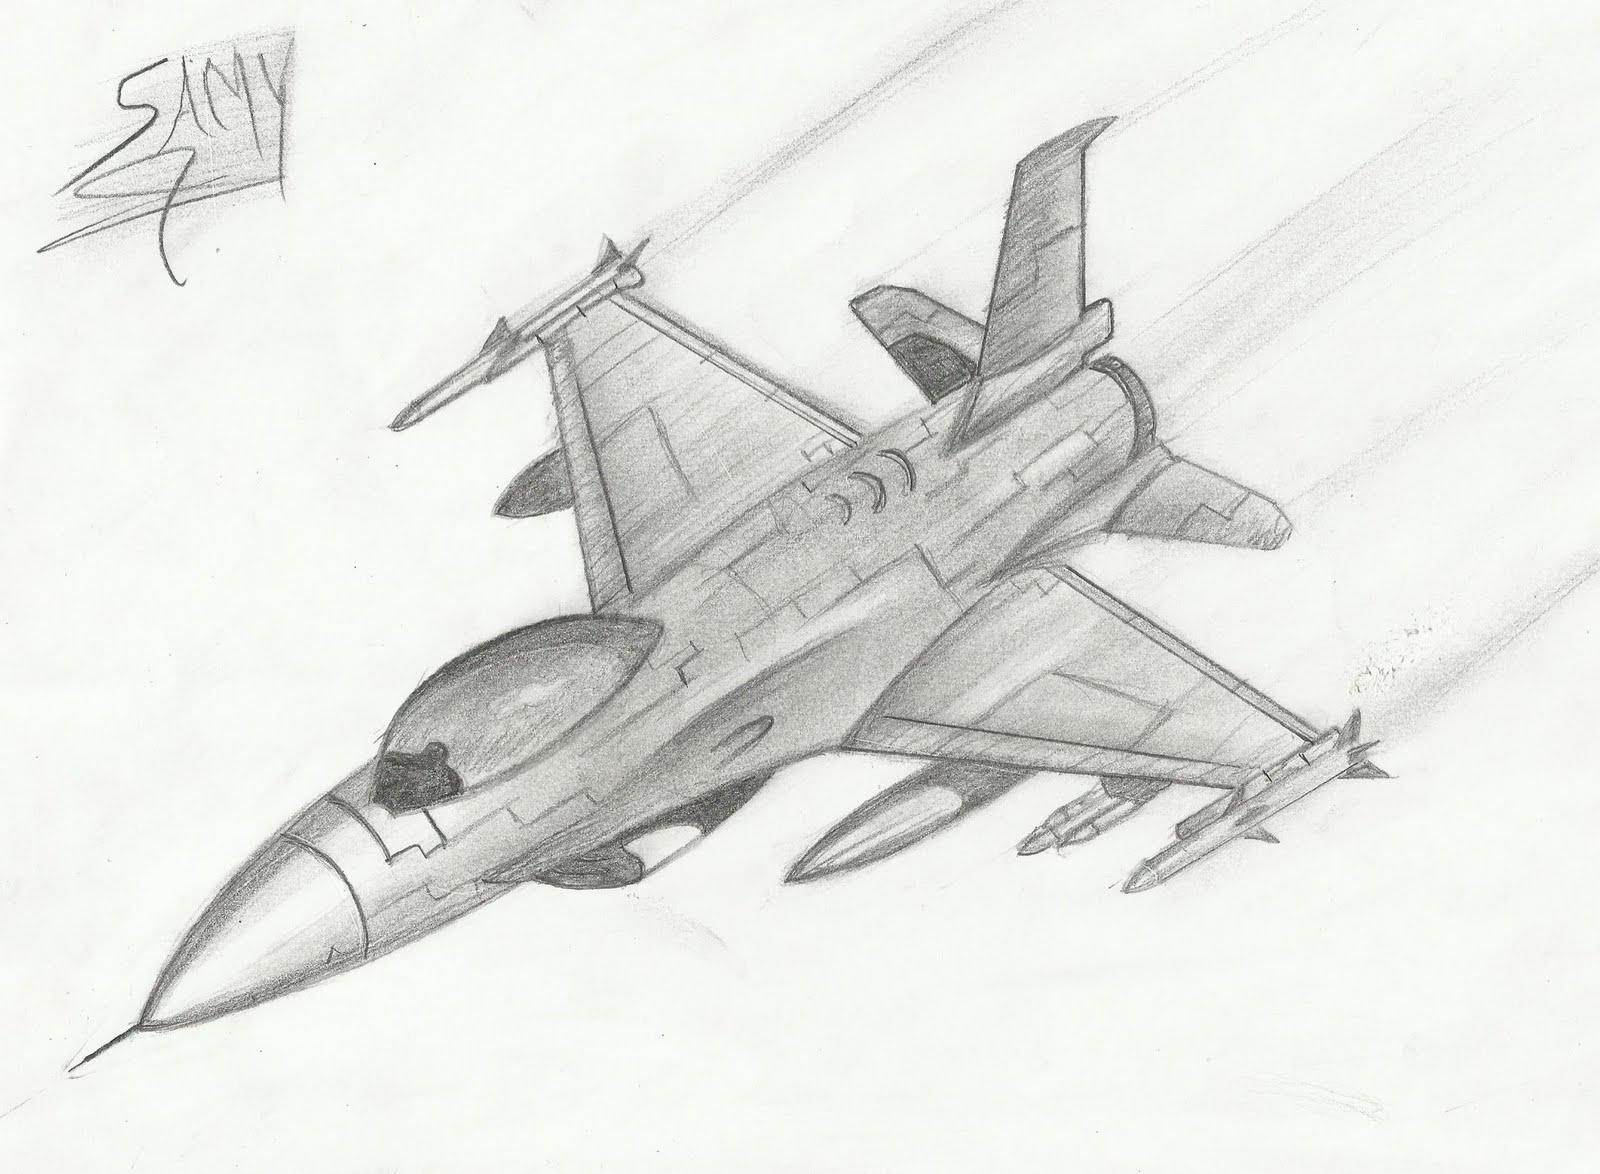 L 39 art du dessin drawing - Avion en dessin ...